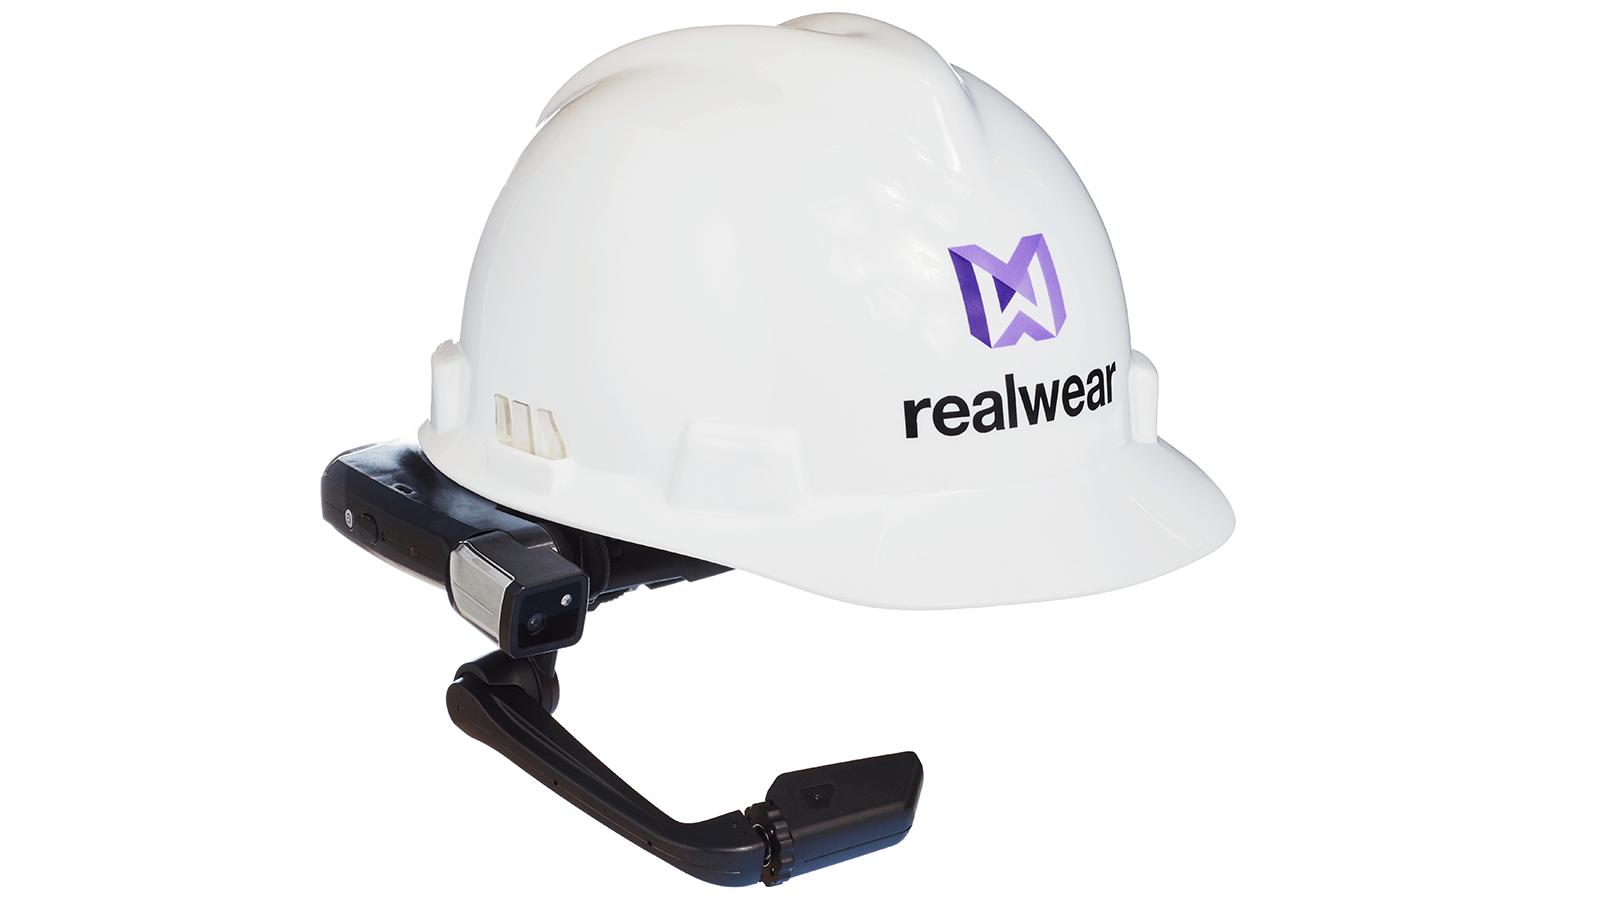 Imagen de un casco RealWear.